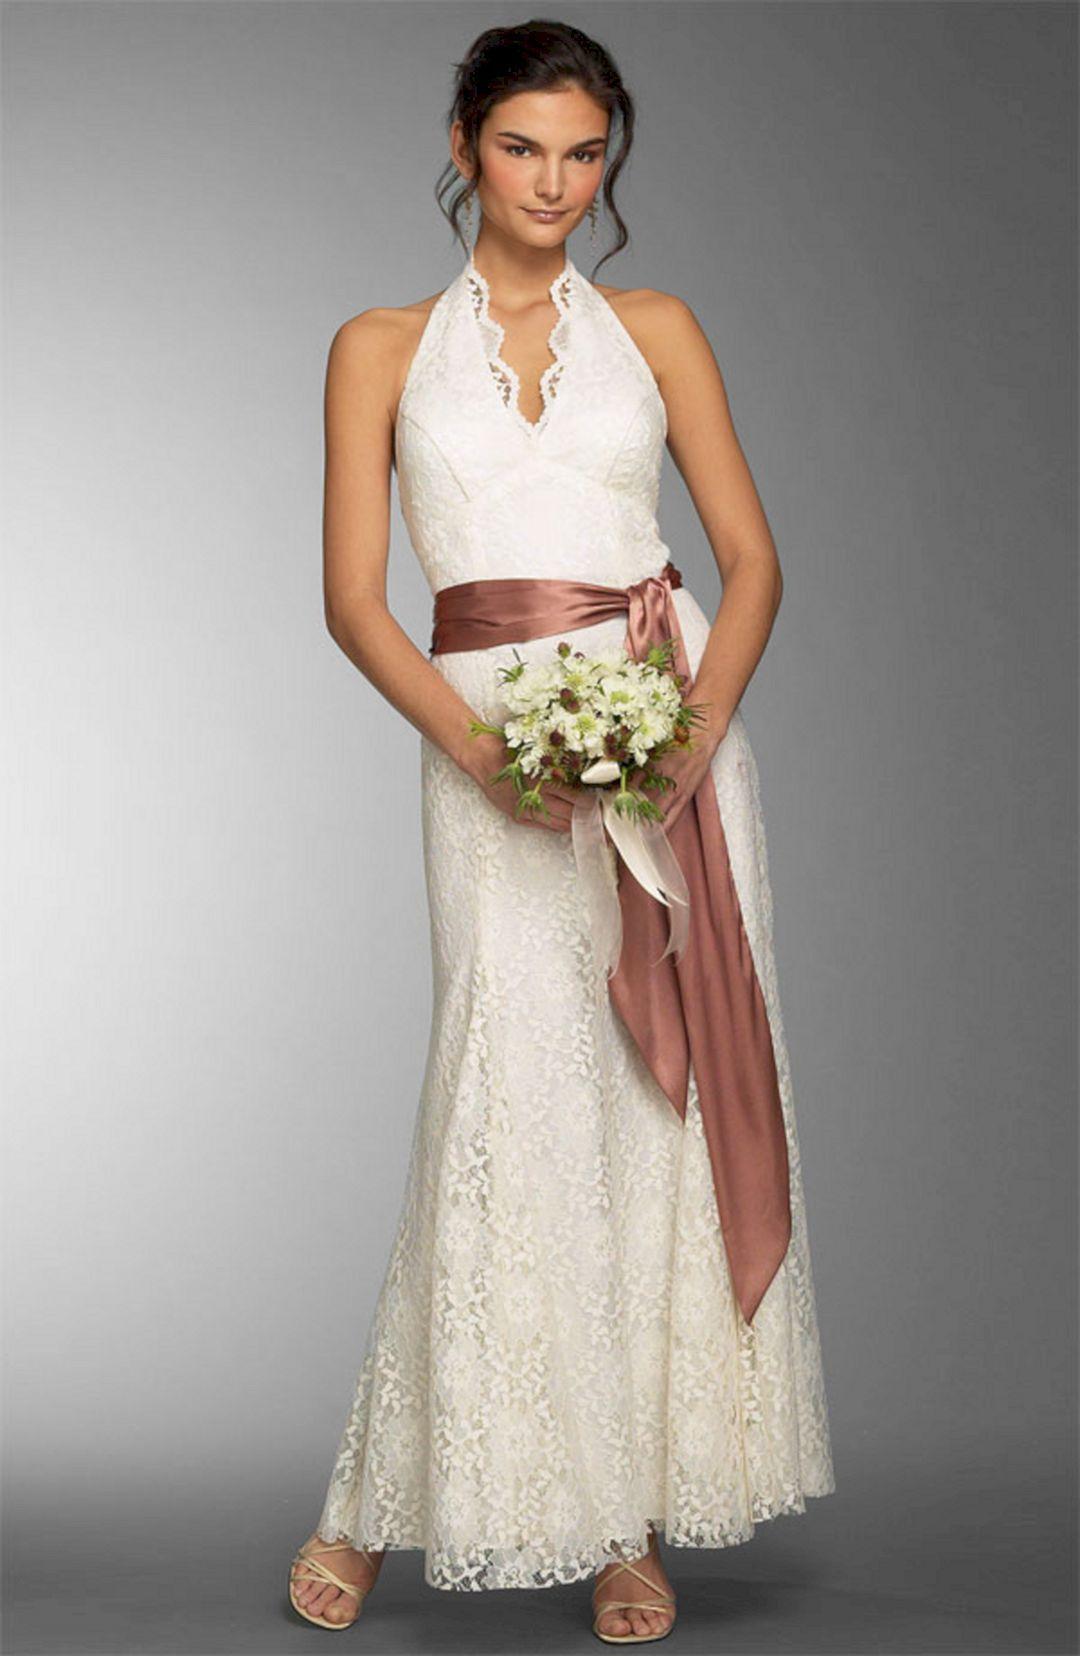 Gloomy beautiful summer casual wedding dresses ideas